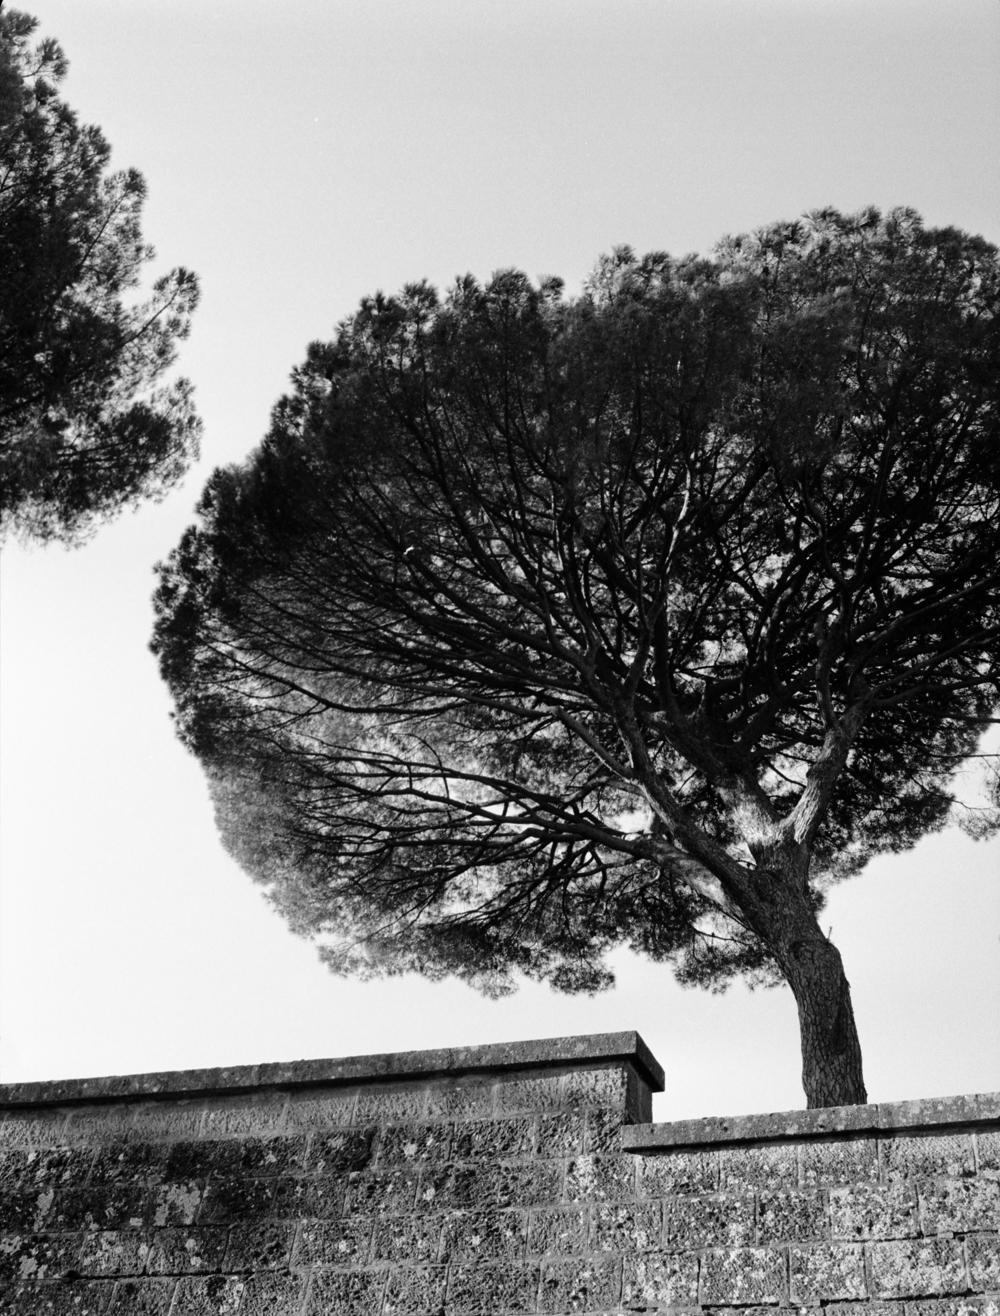 Philippe_Vandenbroeck_Rome_011.jpg